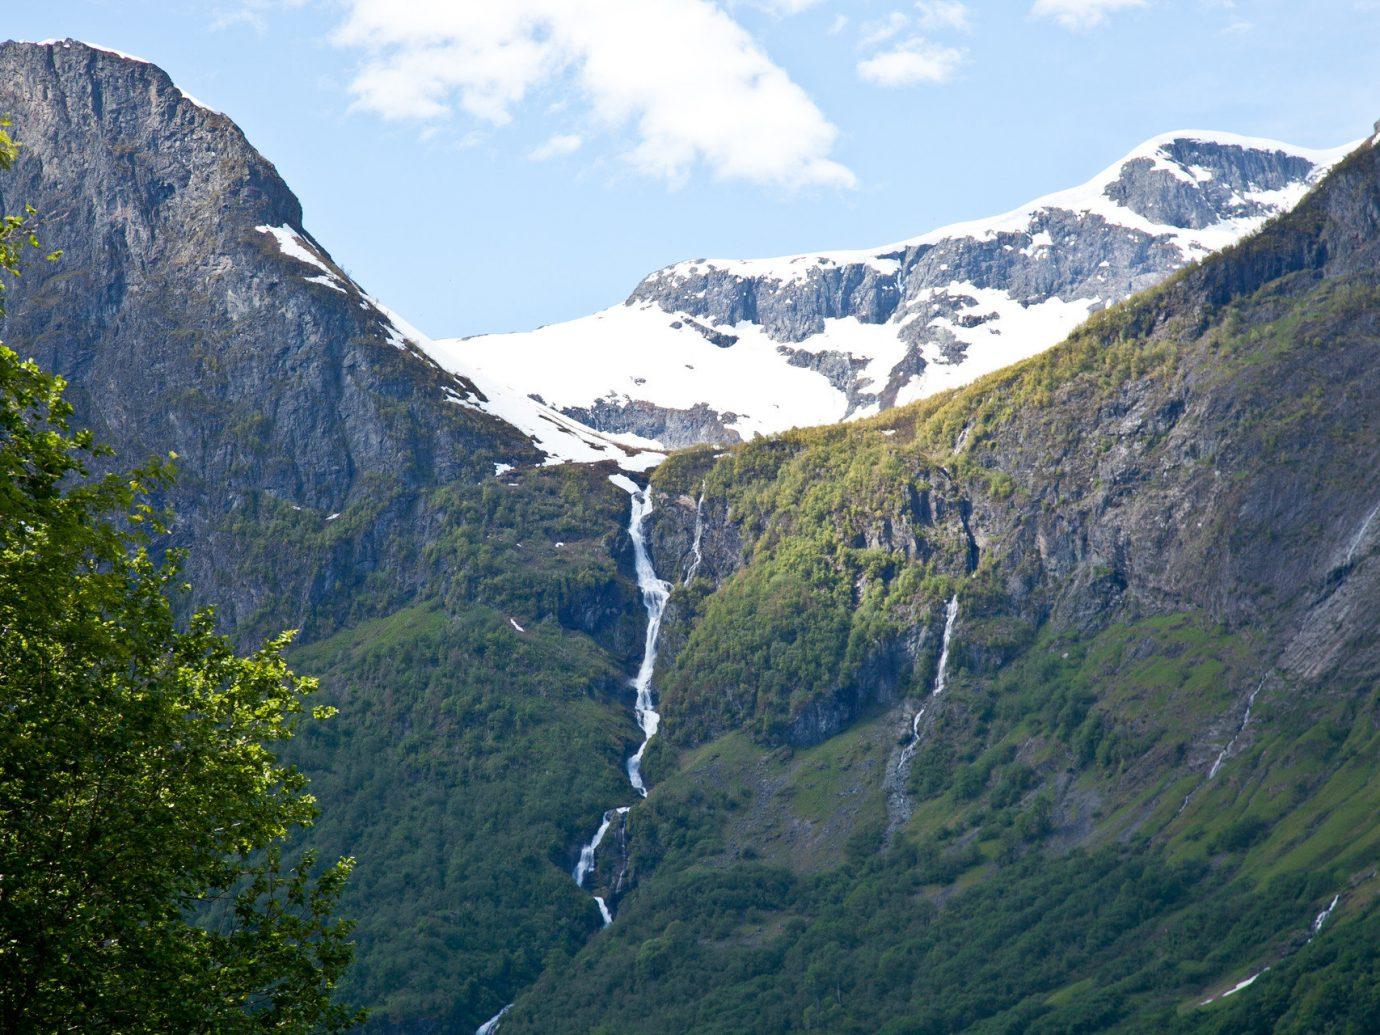 Cliffs Mountains Nature Scenic Views Trees Trip Ideas View Waterfall Waterfalls Mountain Outdoor Sky Mountainous Landforms